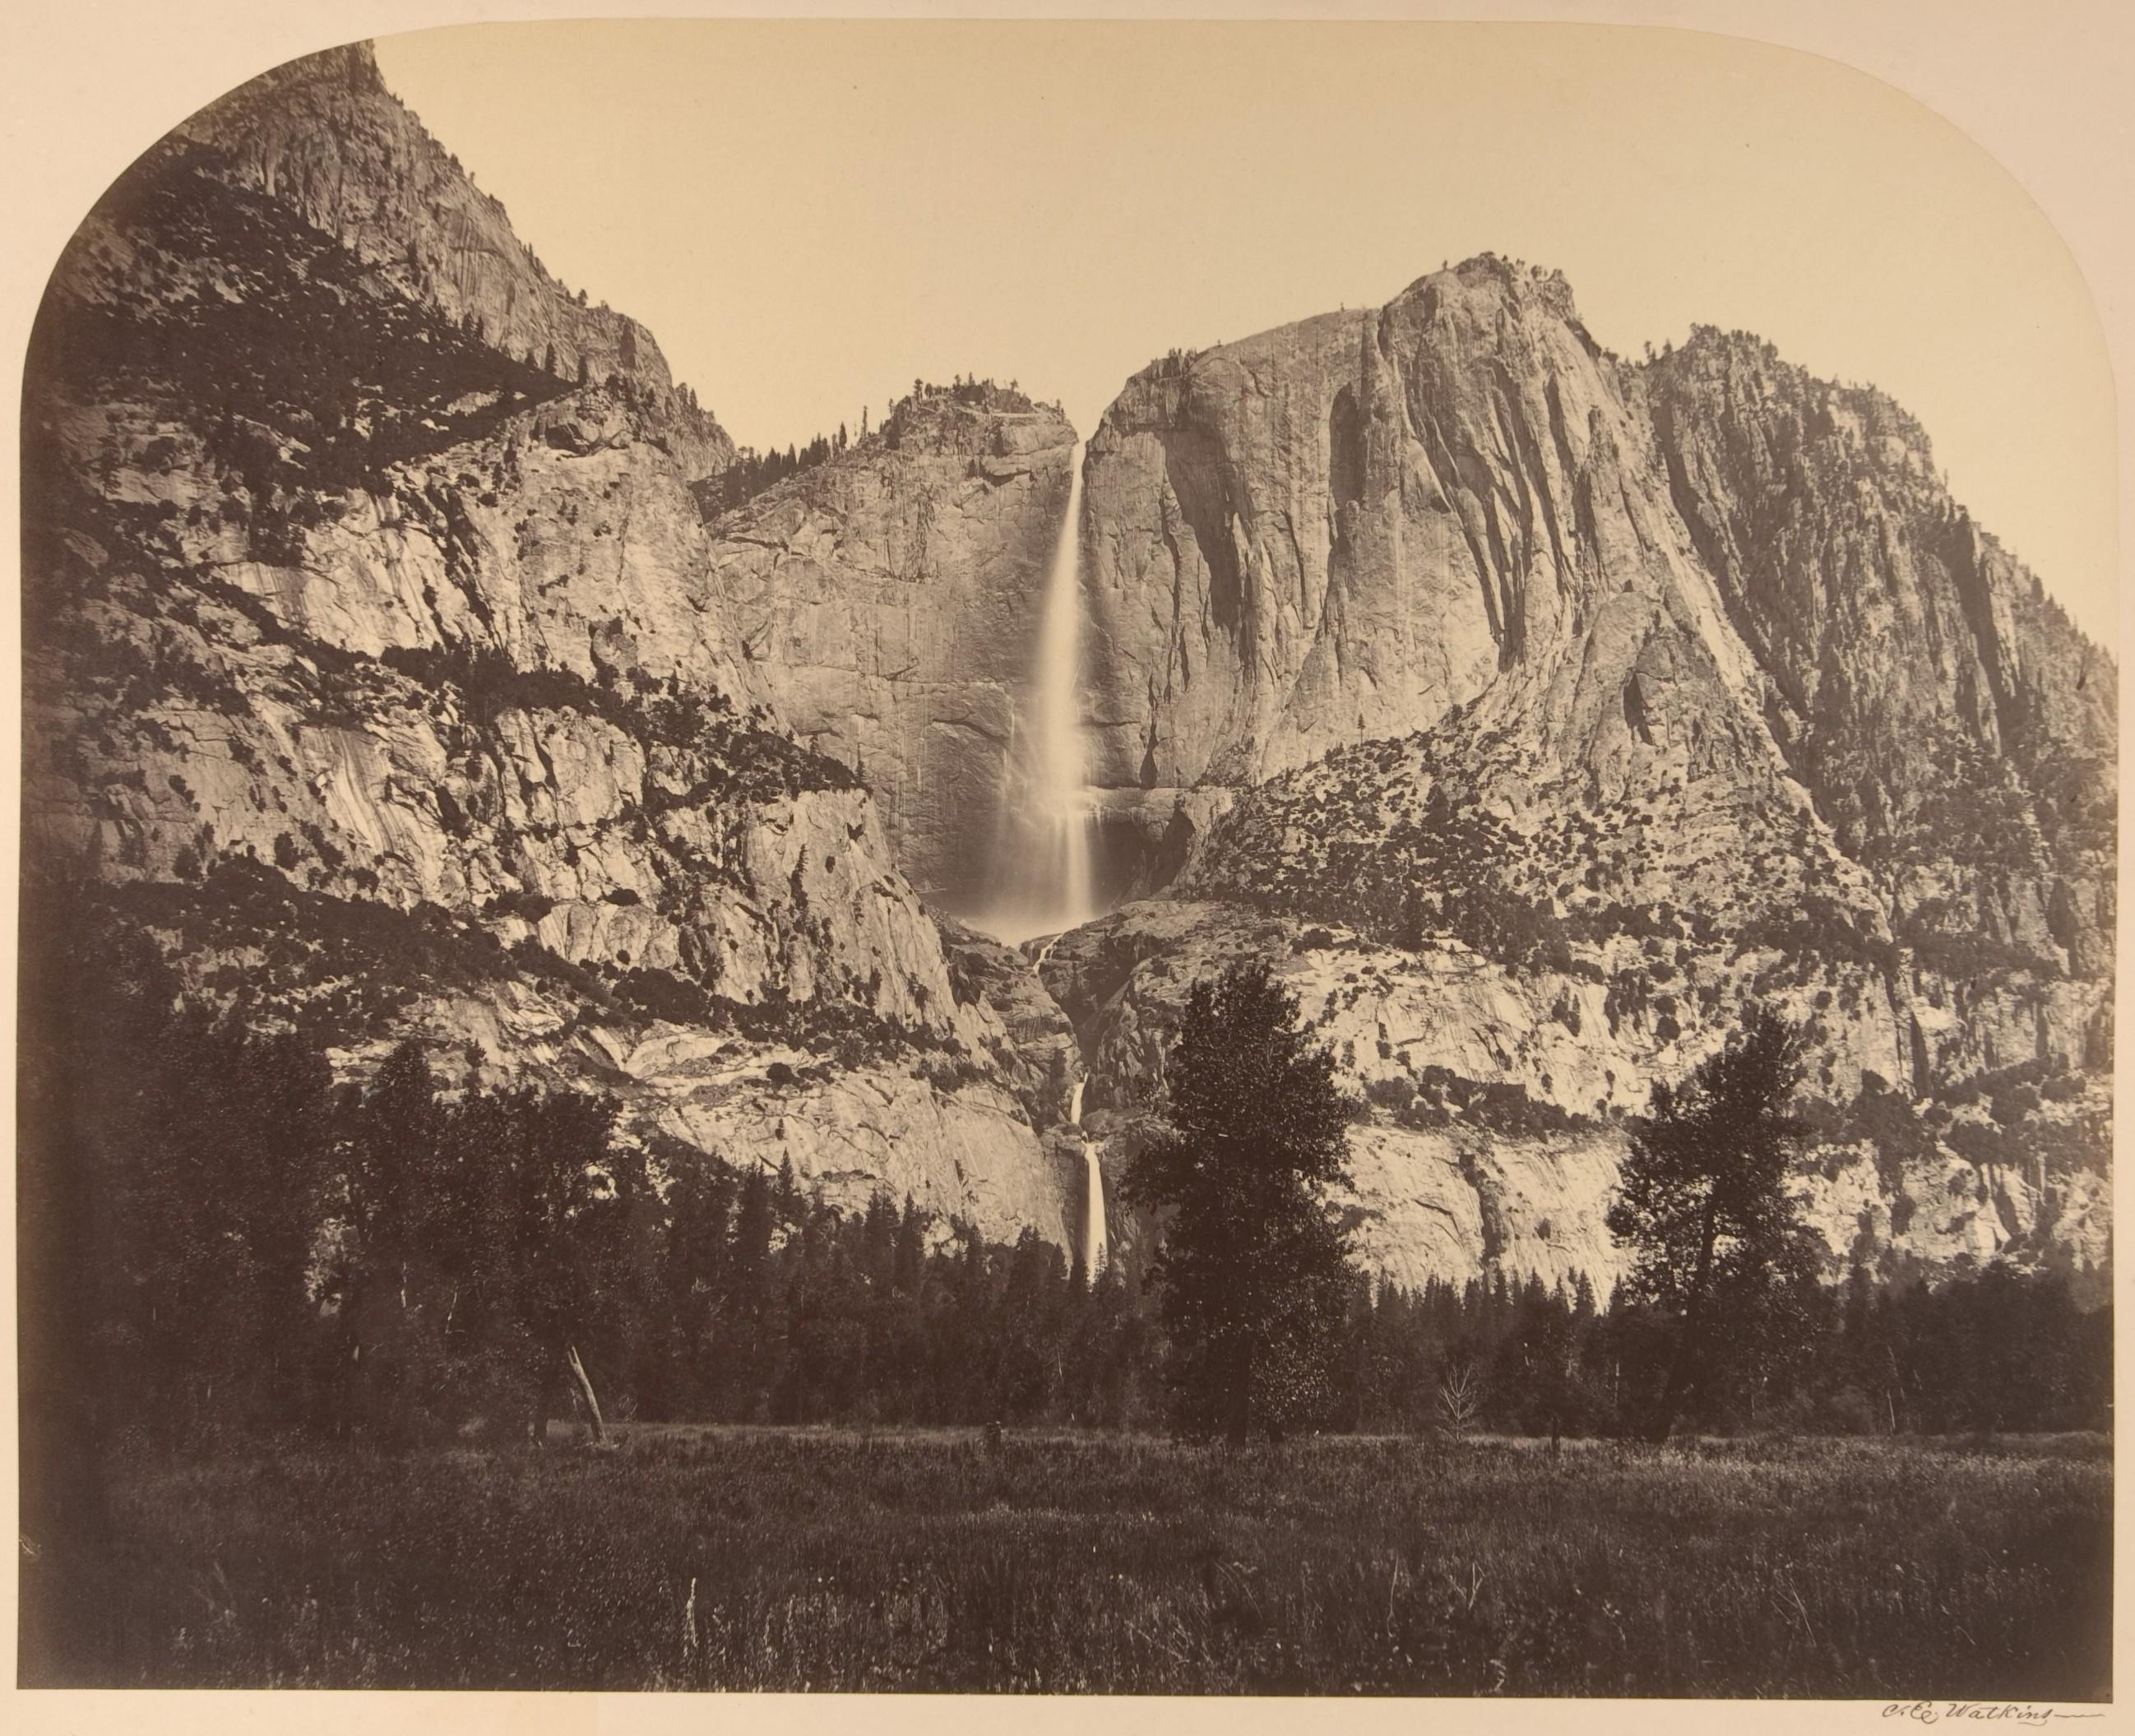 Fotó: Carleton Watkins: 2637 Ft. Yosemite Fall, Front View, 1861 © Carleton Watkins / The Metropolitan Museum of Art